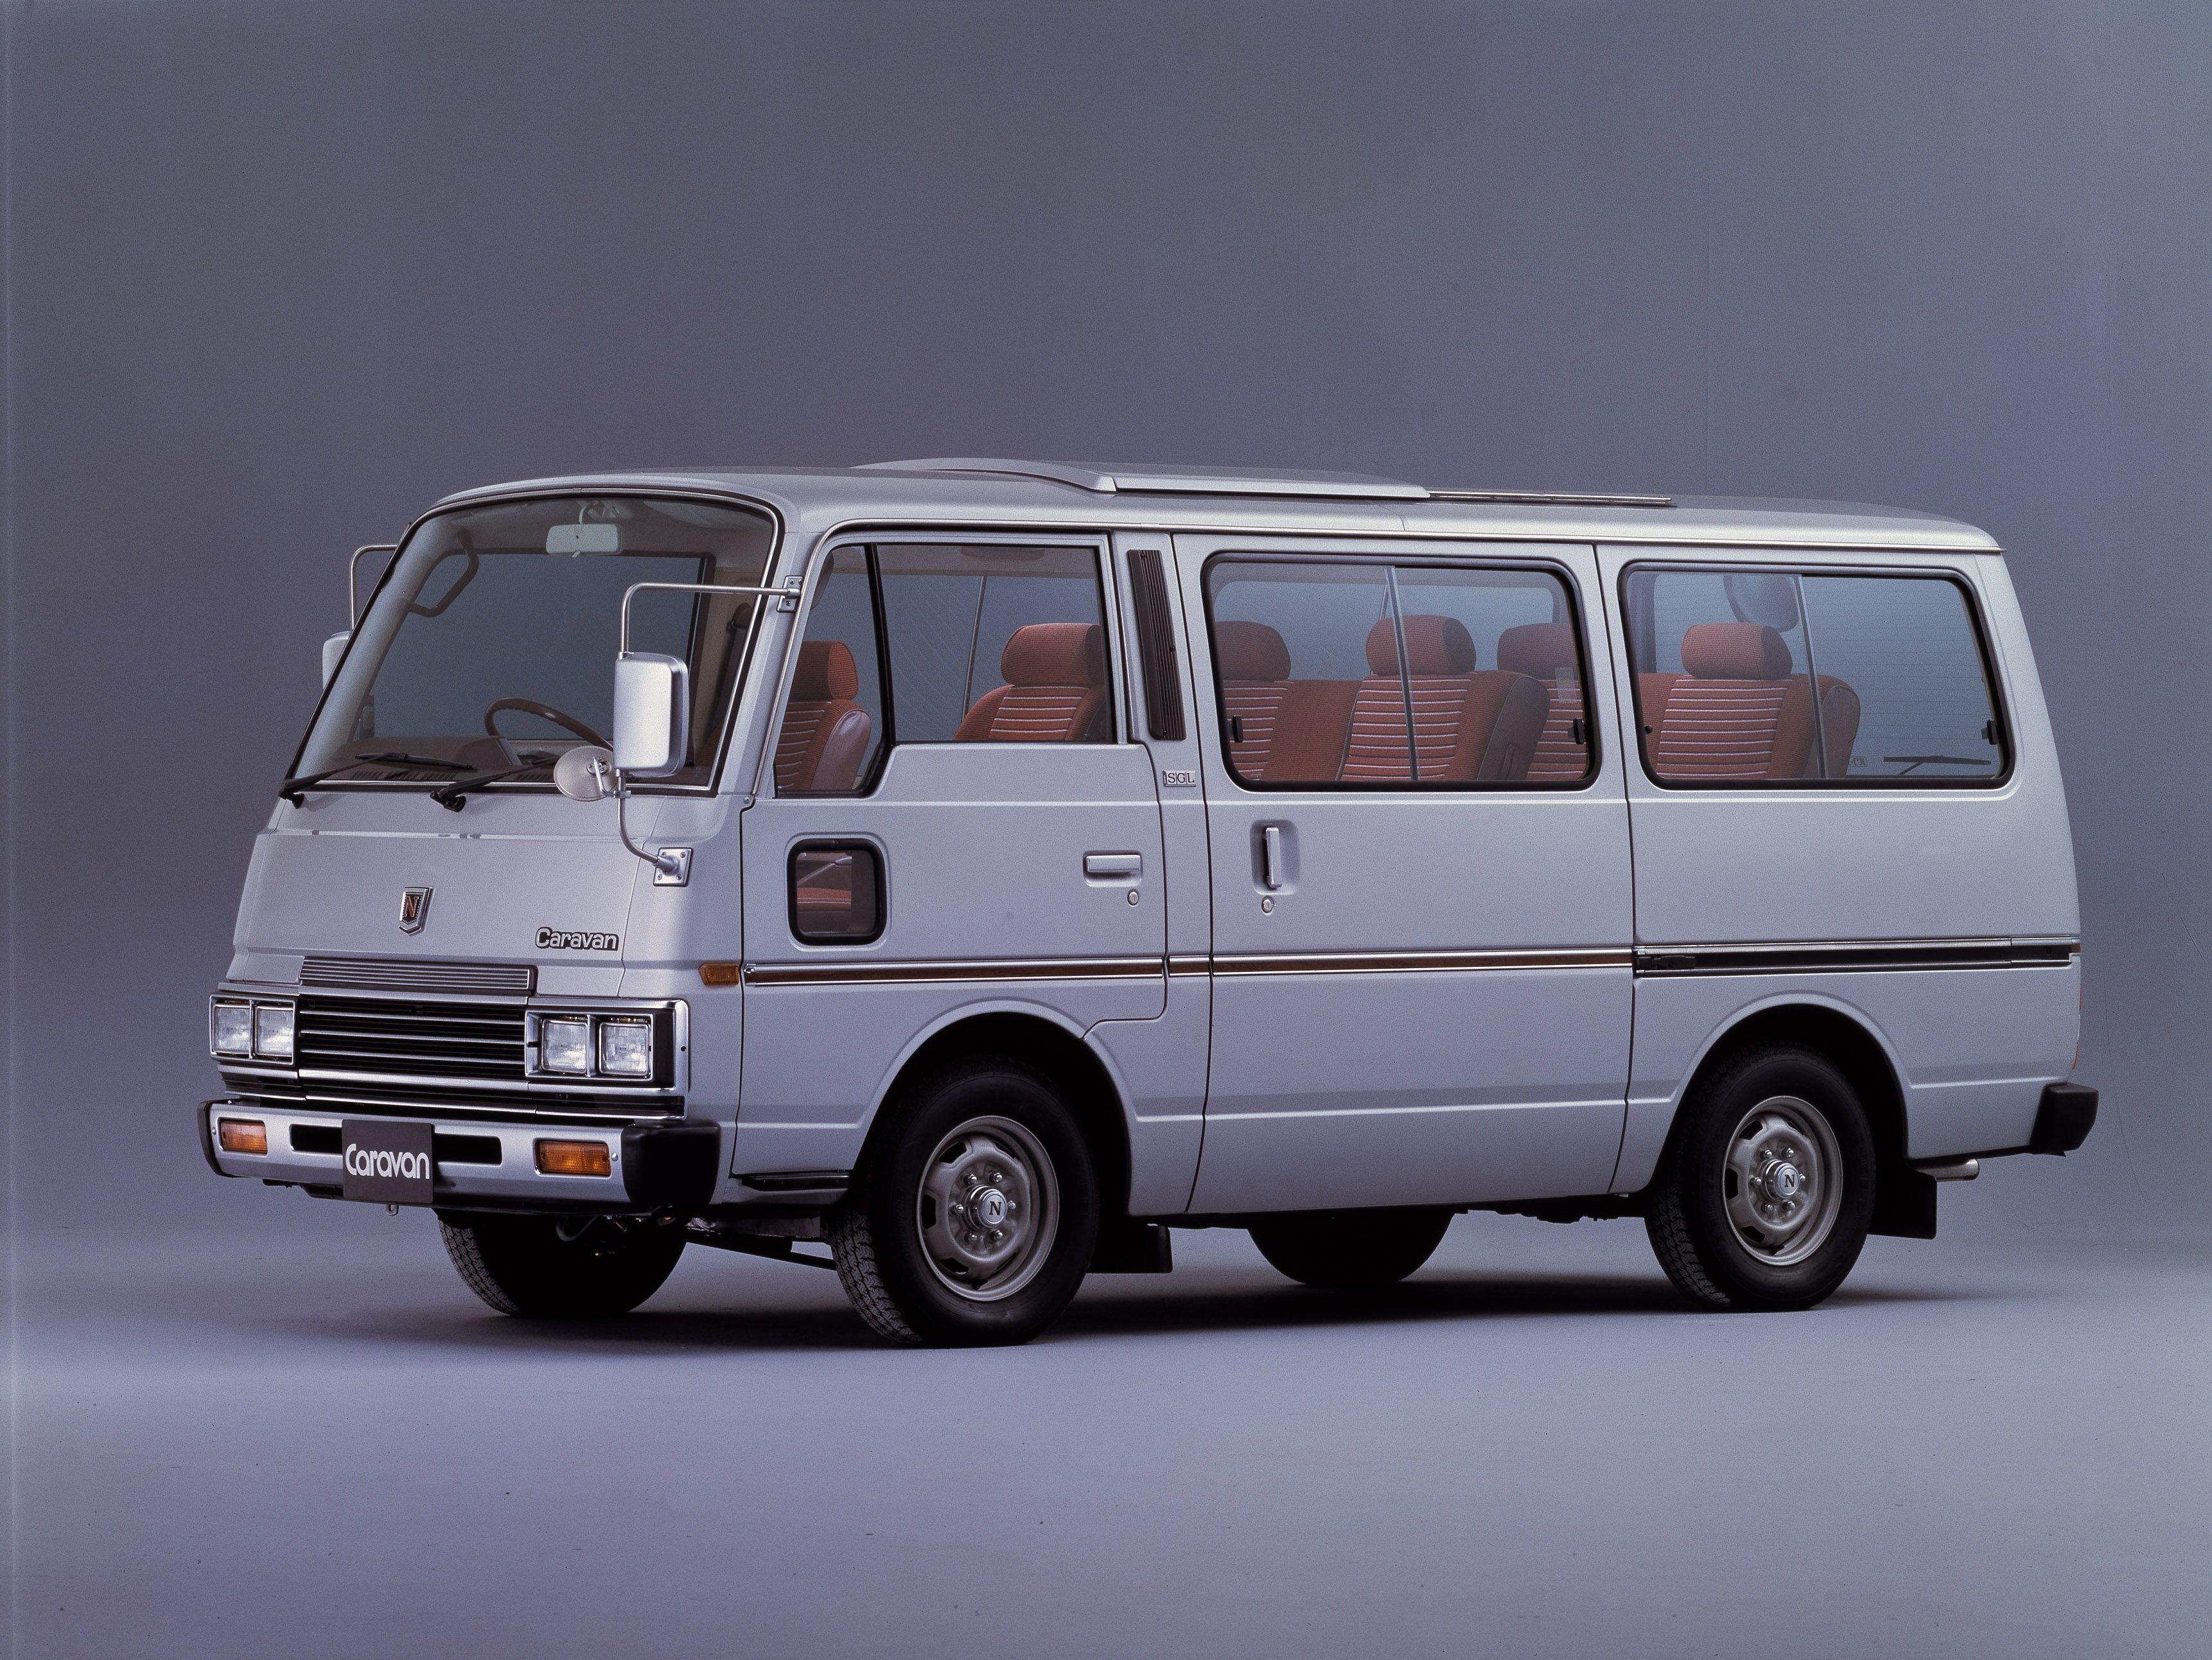 Nissan caravan silk road e23 1983 86